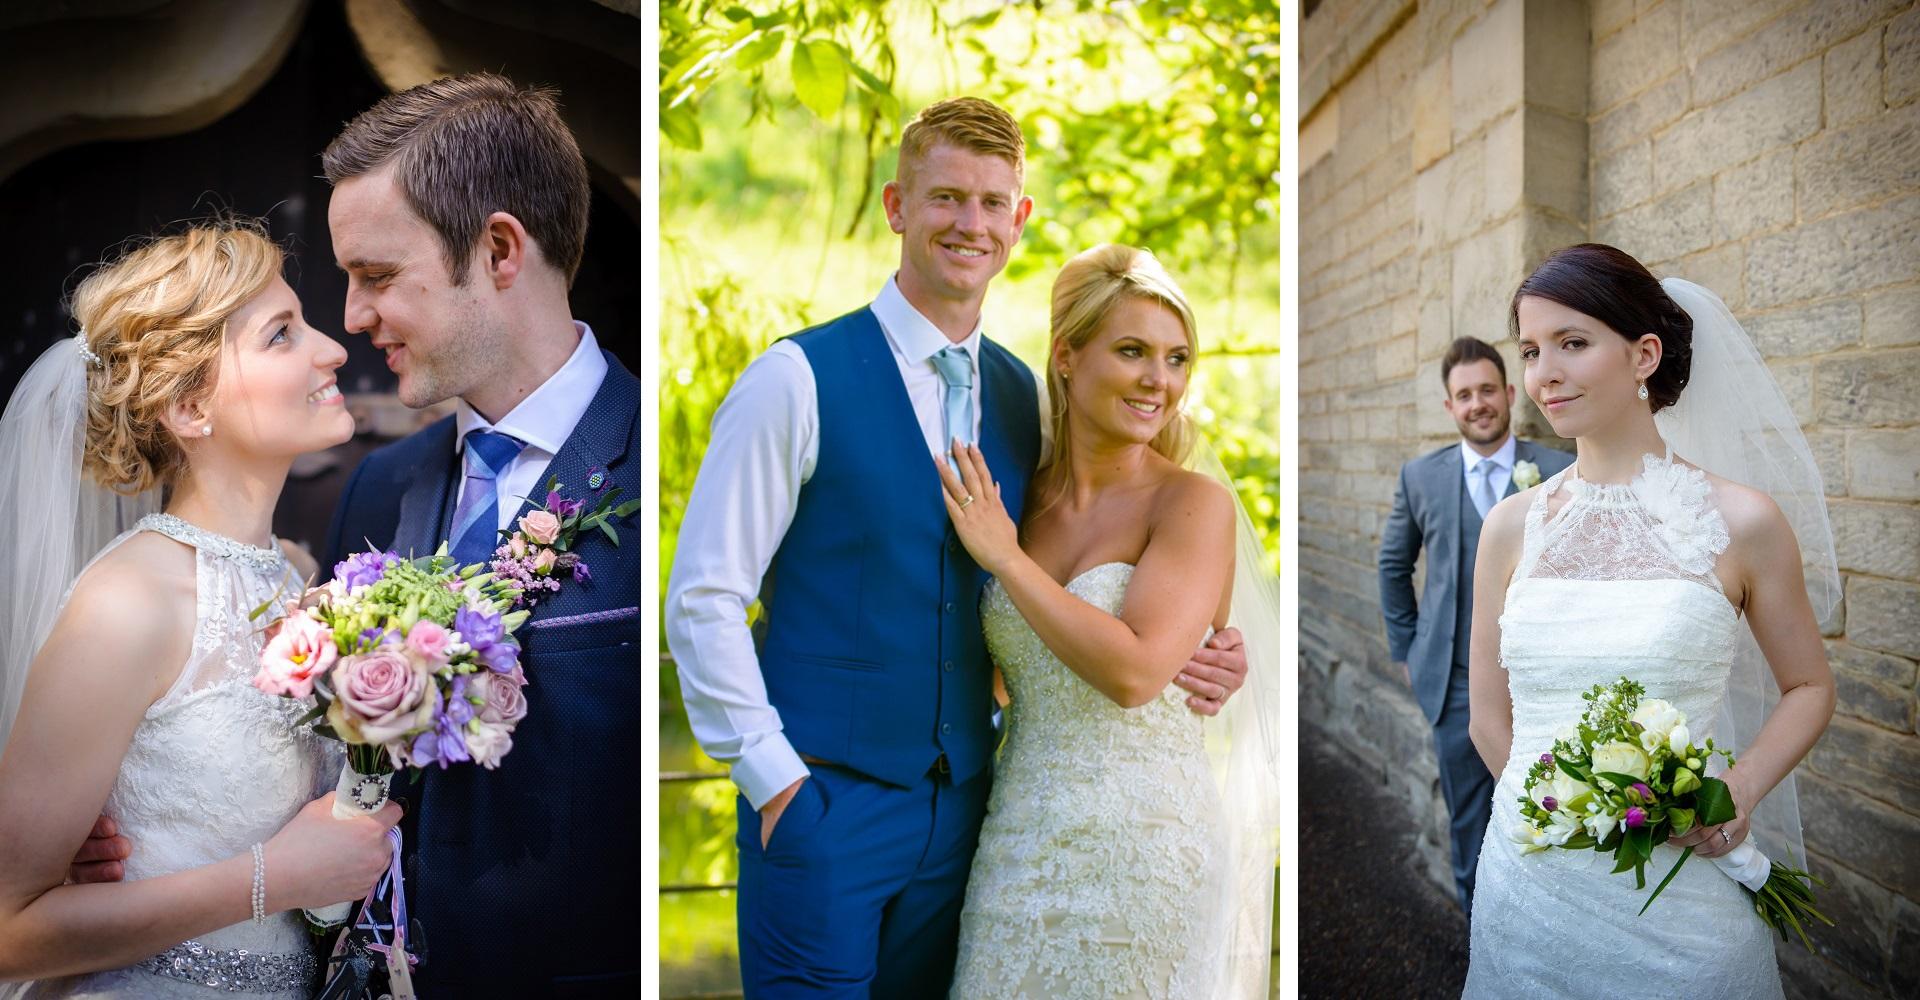 chris-fossey-photography-warwickshire-oxfordshire-gloucestershire-worcestershire-stratford-upon-avon-wedding-commercial-photographer-uk-based-1